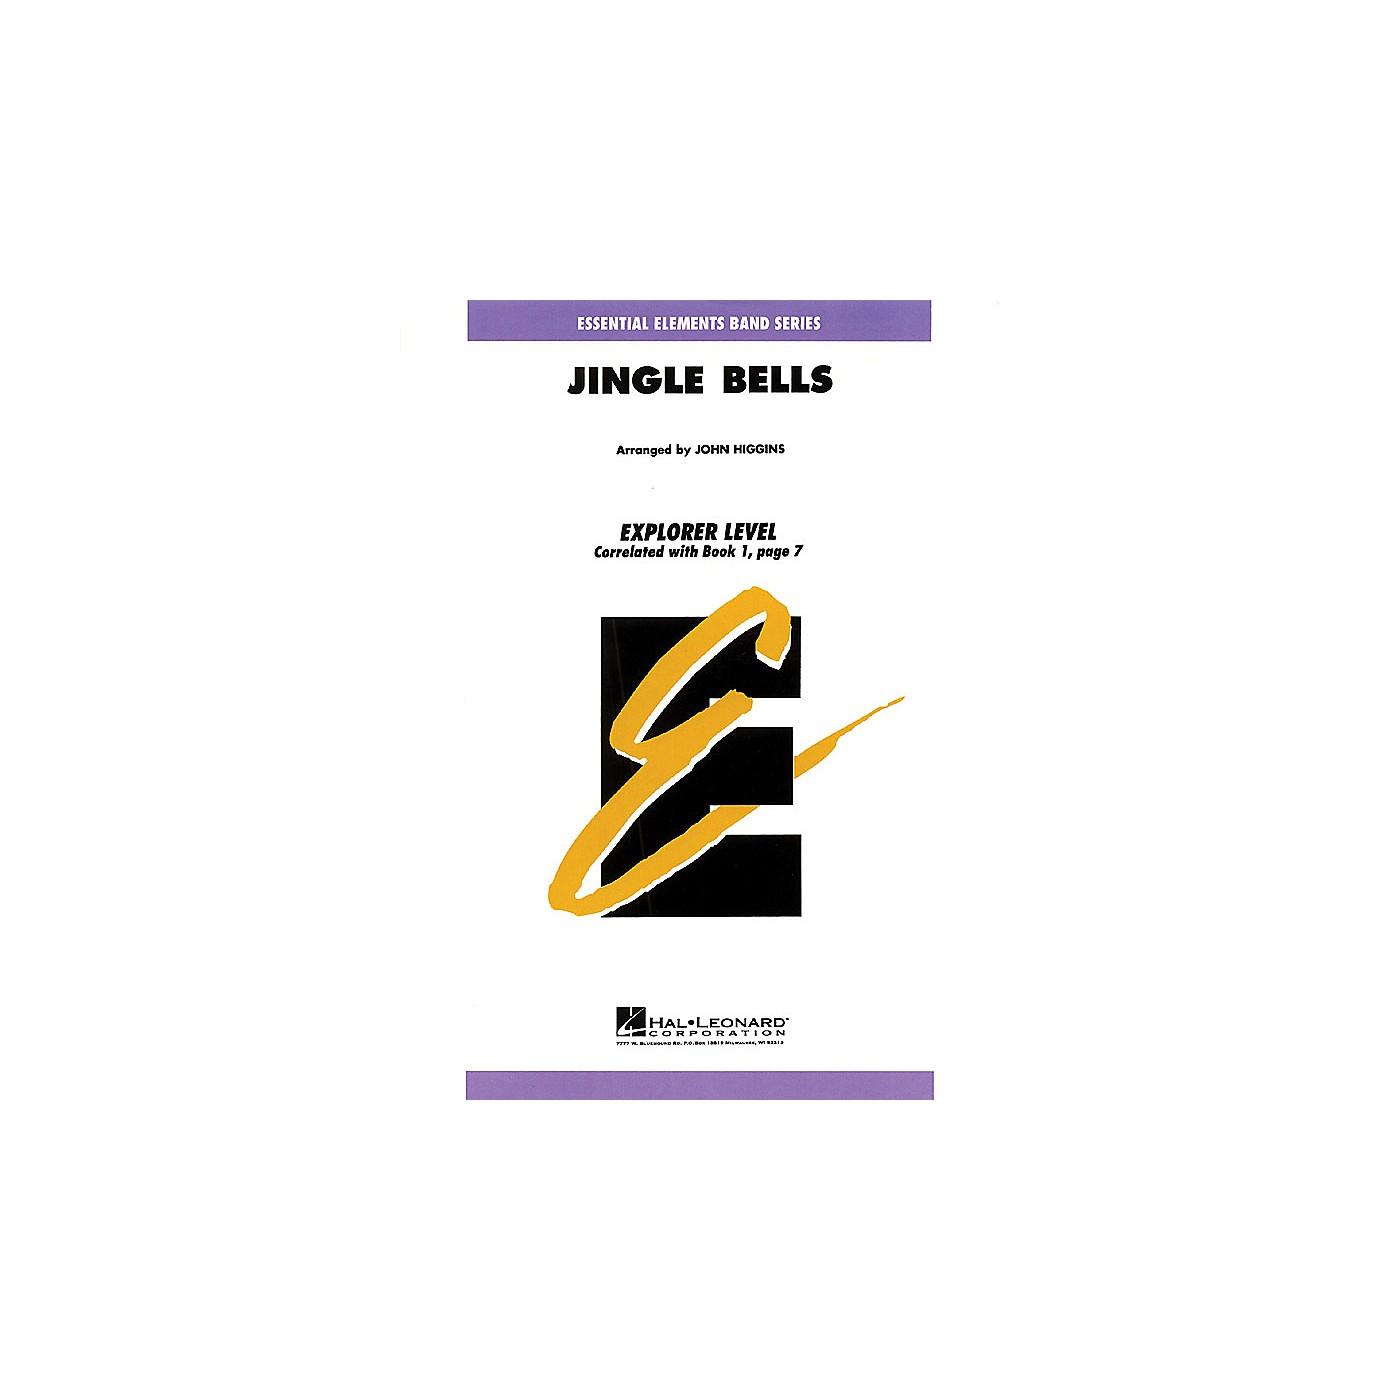 Hal Leonard Jingle Bells Concert Band Level 0.5 Arranged by John Higgins thumbnail